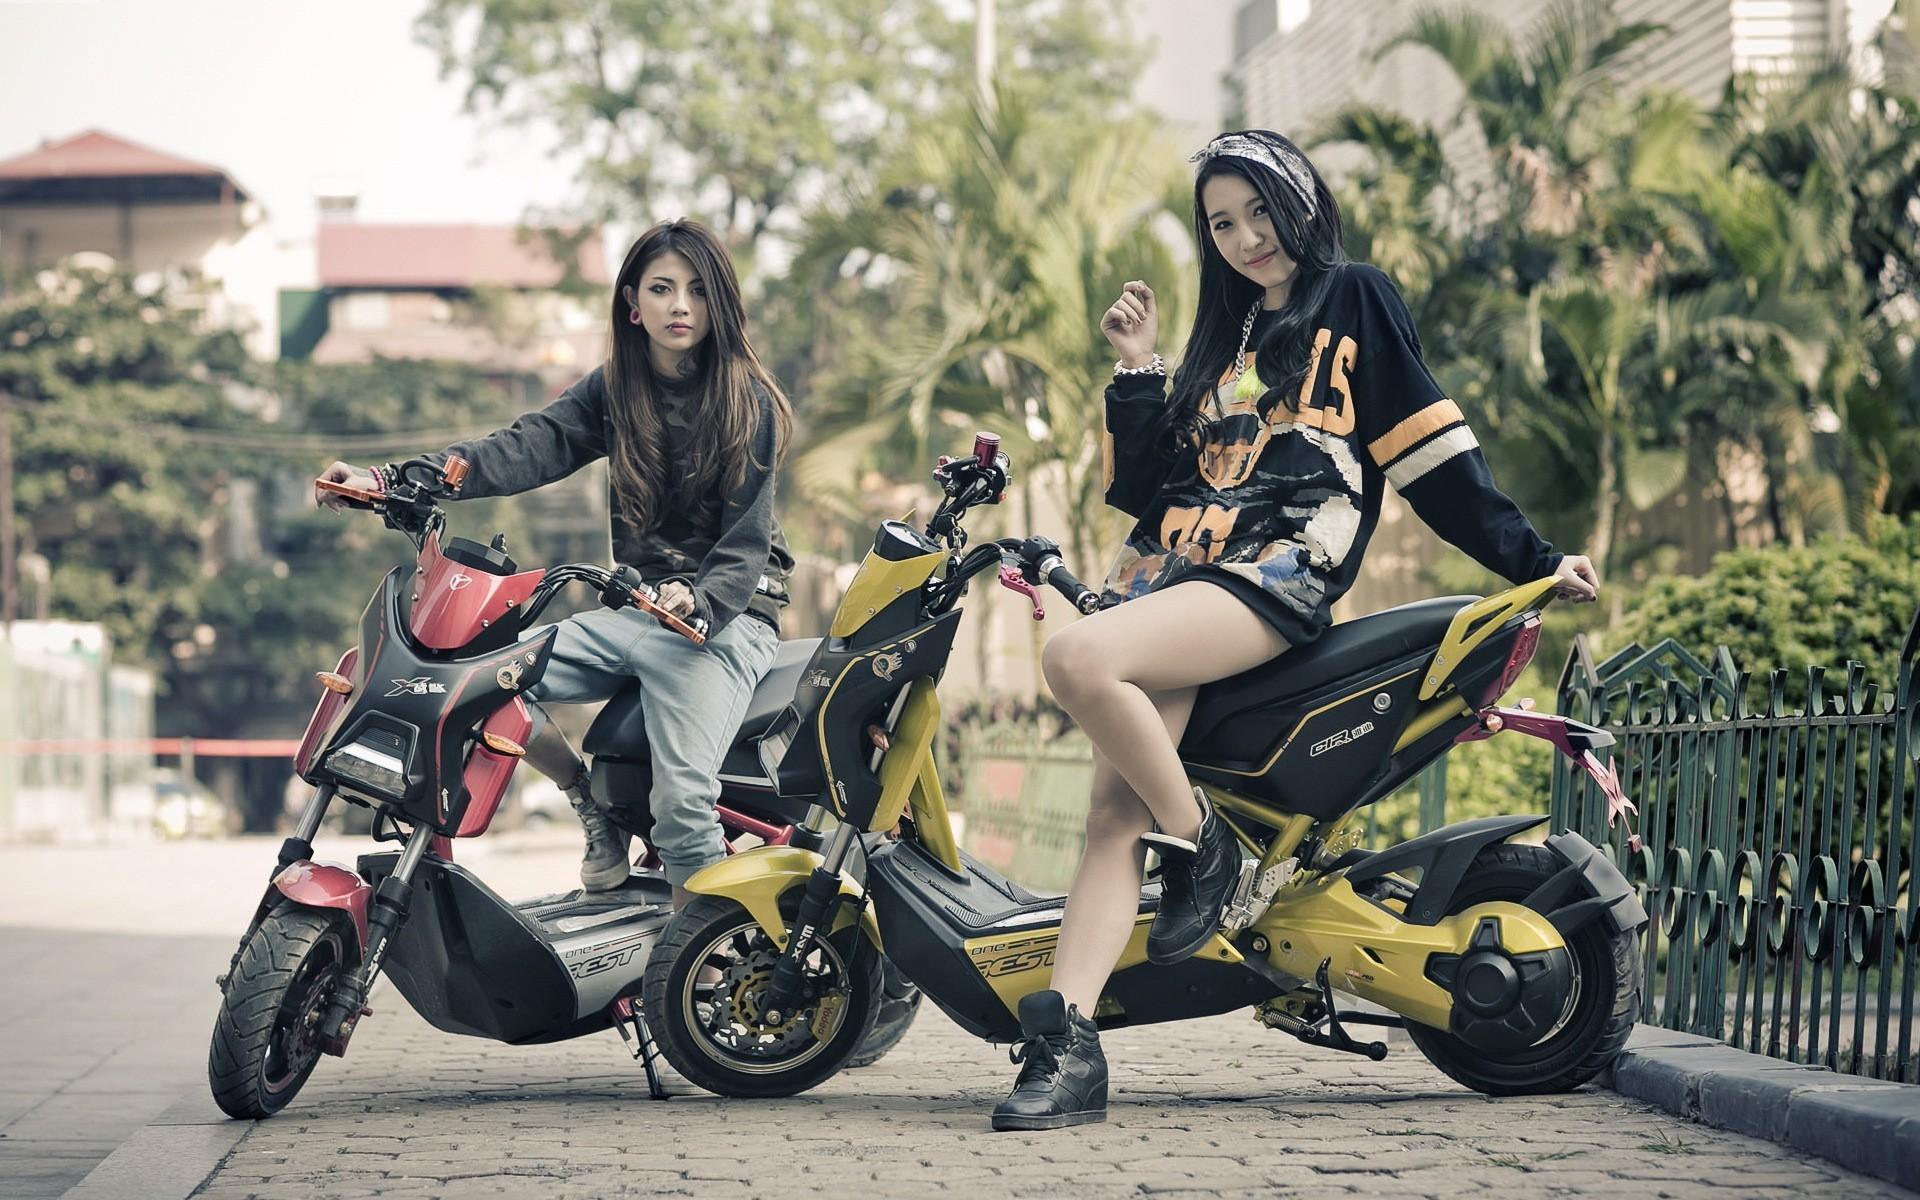 Motorcycle Girl Wallpaper